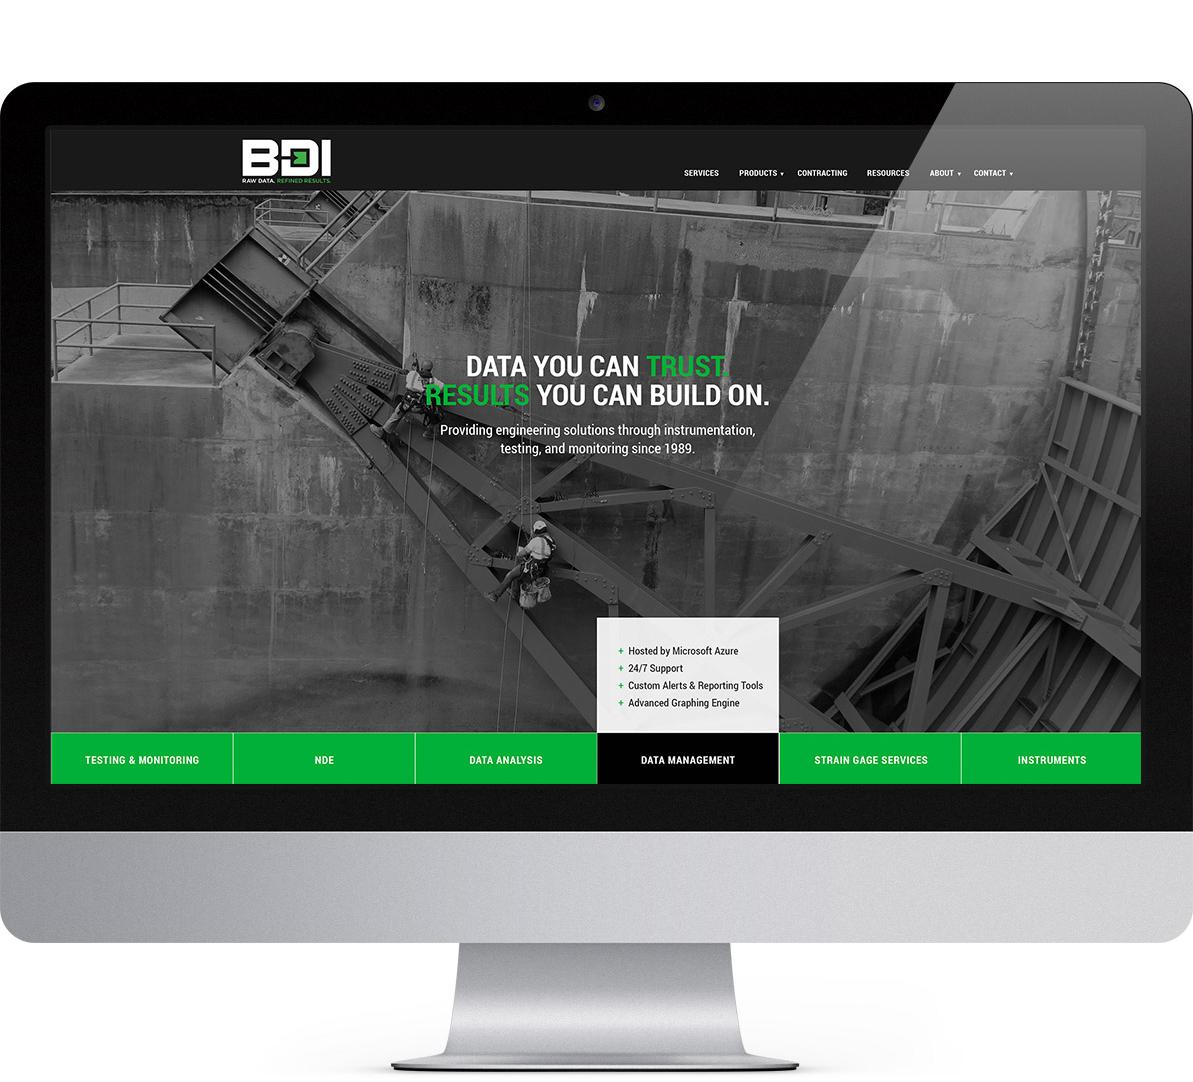 website design for bdi